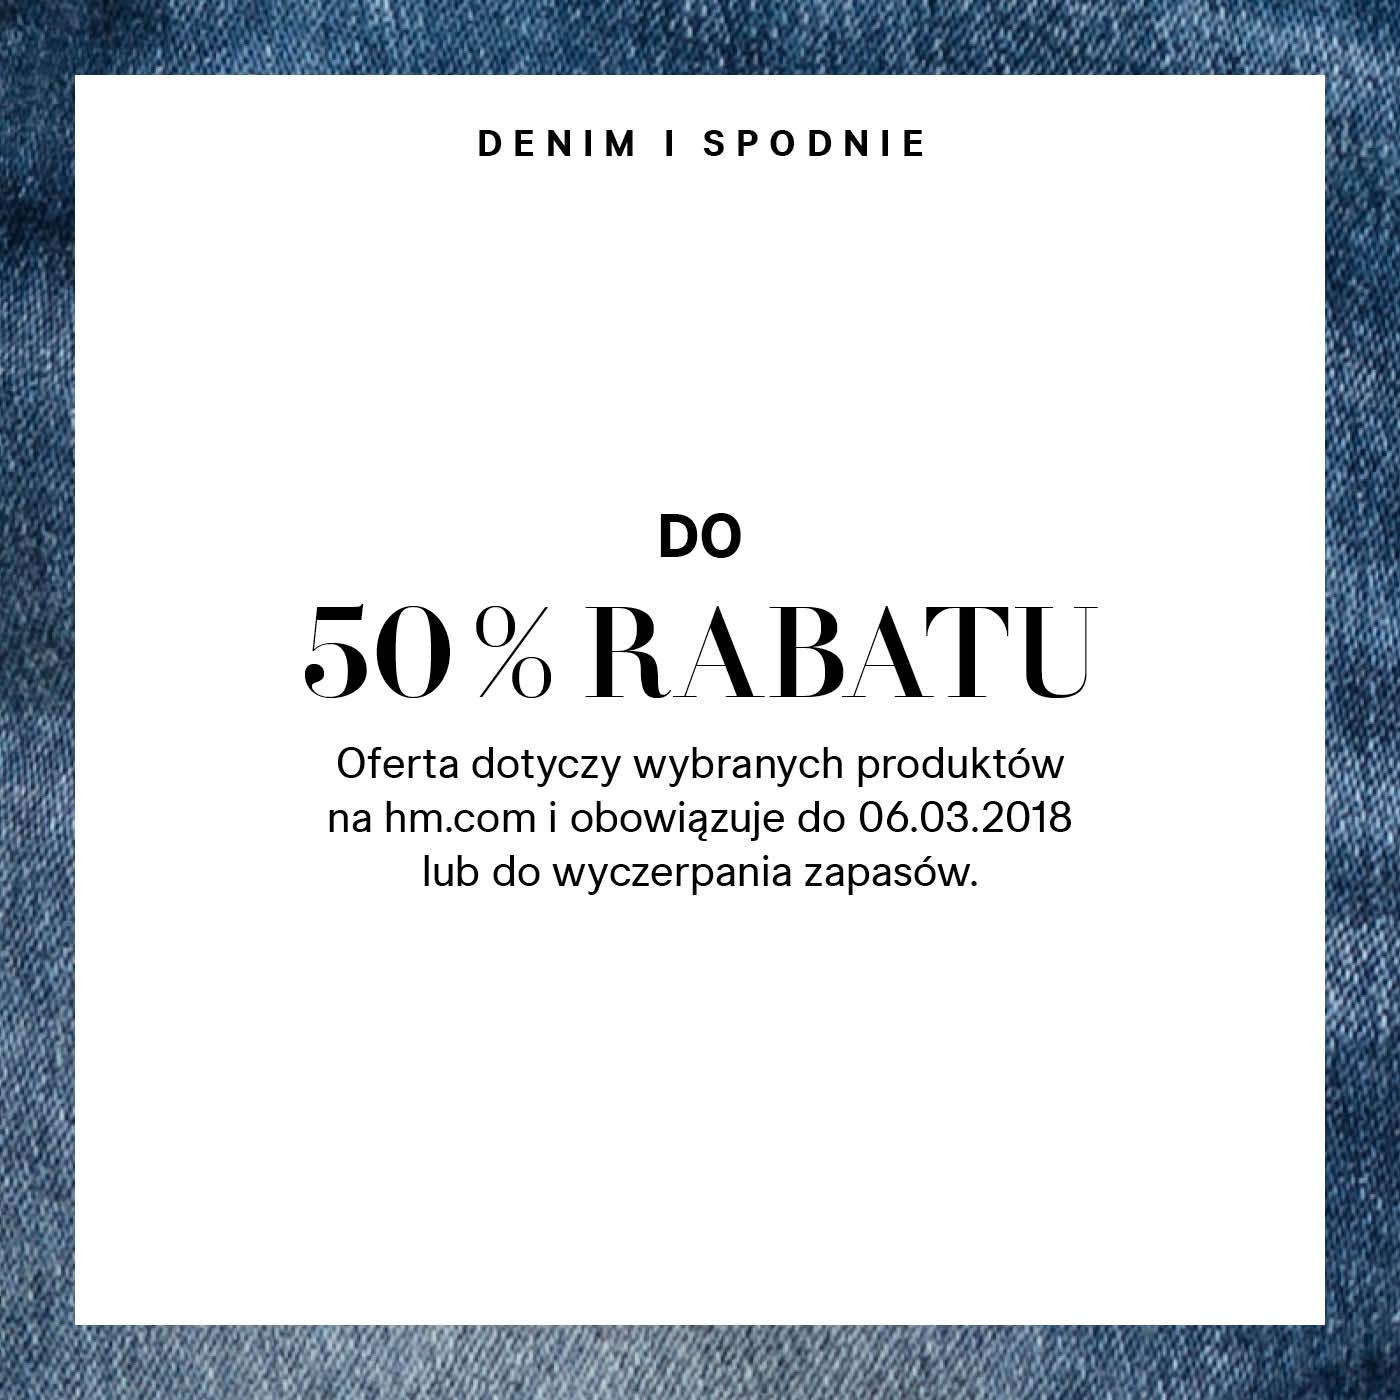 Spodnie wybrane H&M do -50%